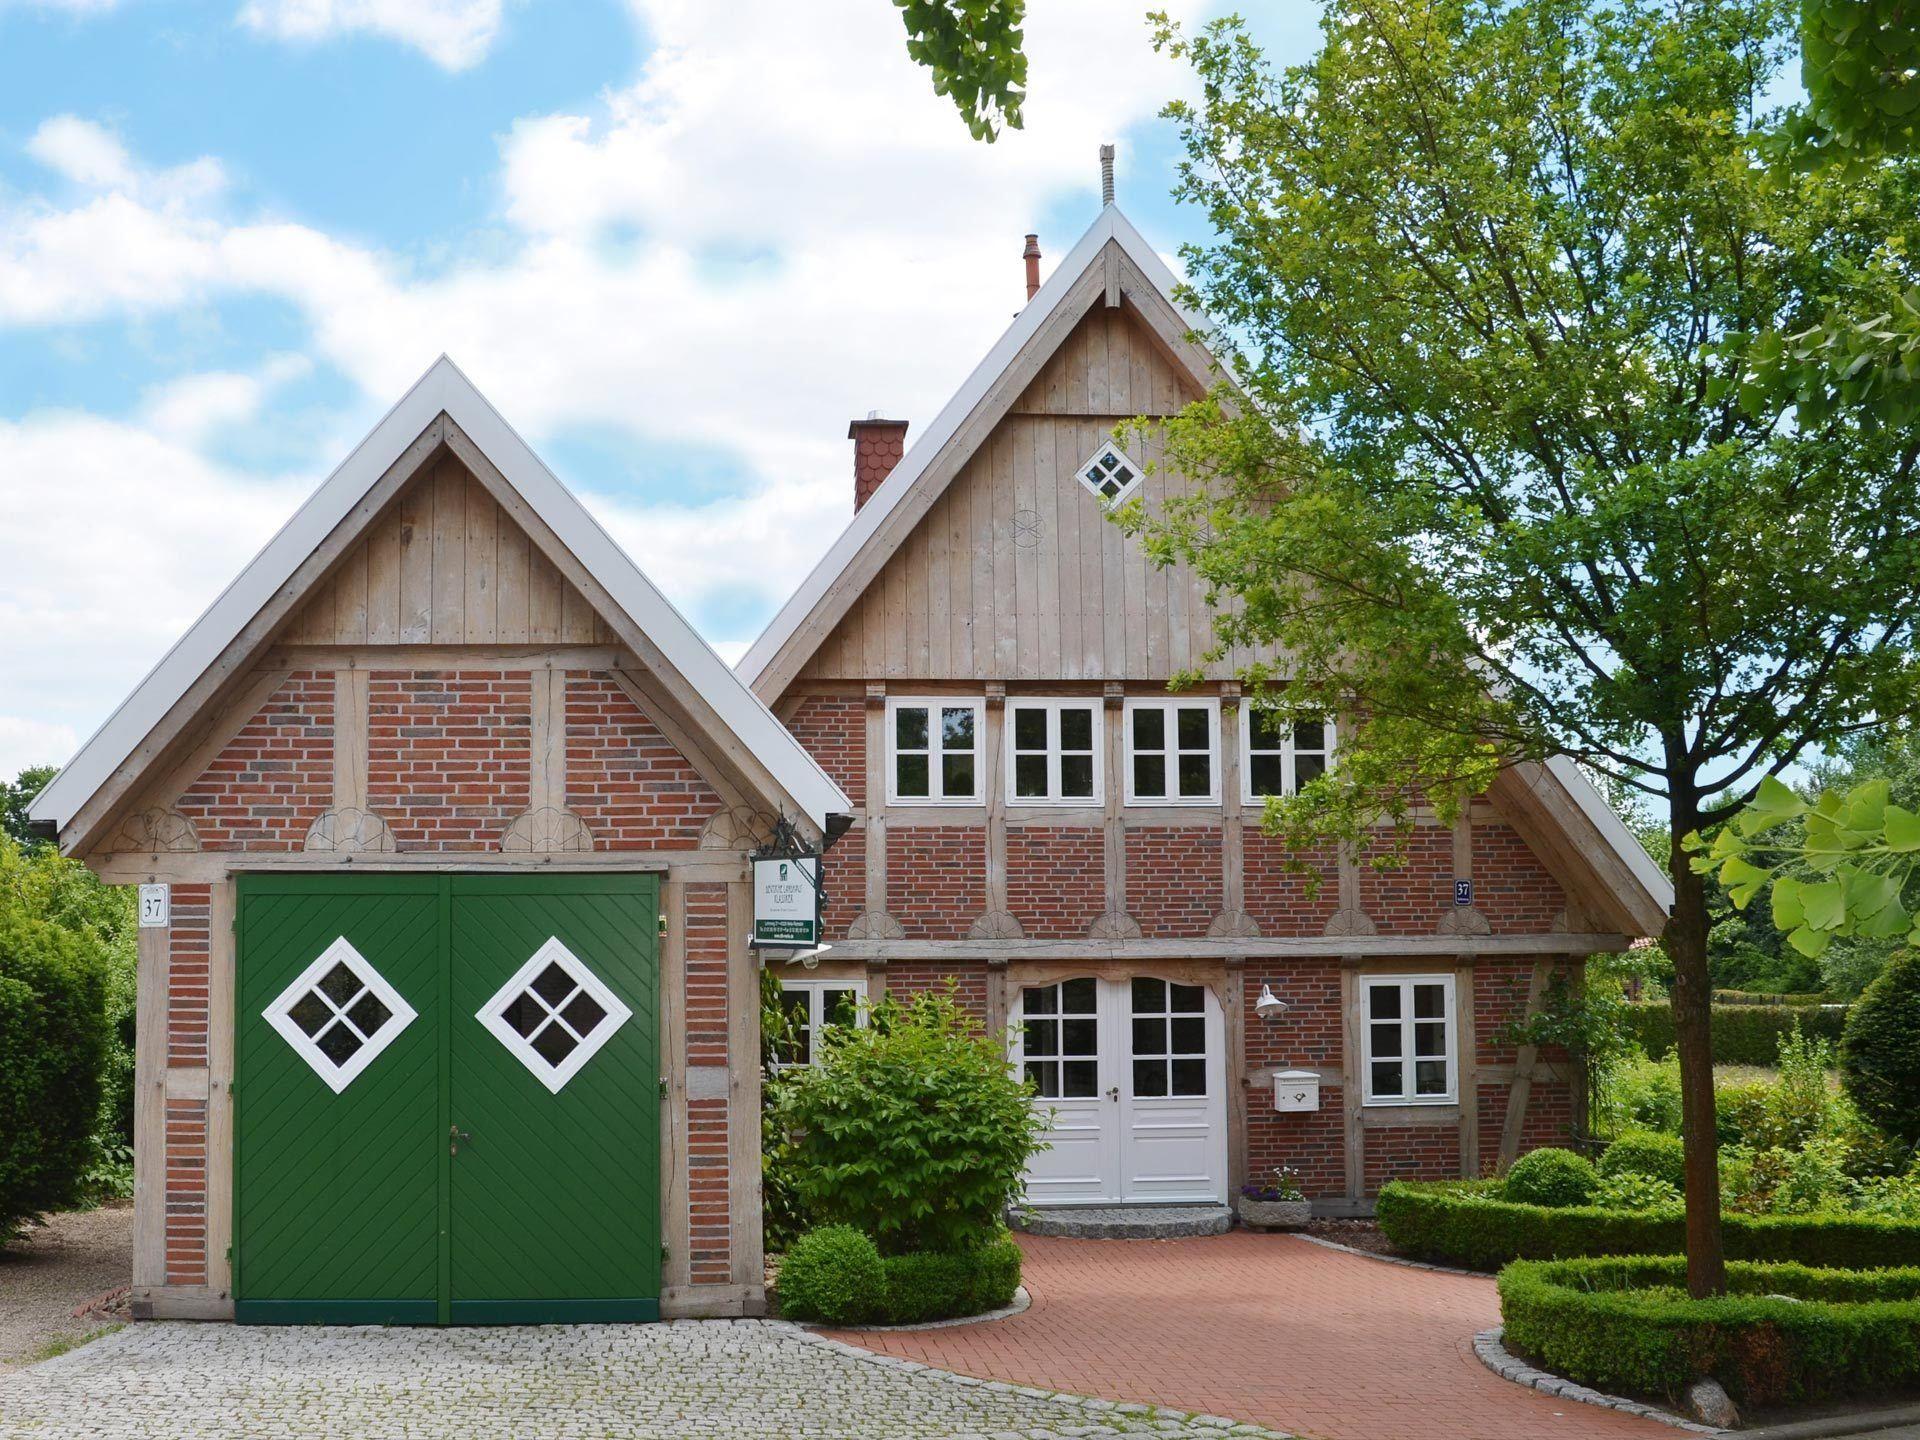 musterhaus melle deutsche landhaus klassiker ansicht 2 hausideen pinterest sims. Black Bedroom Furniture Sets. Home Design Ideas